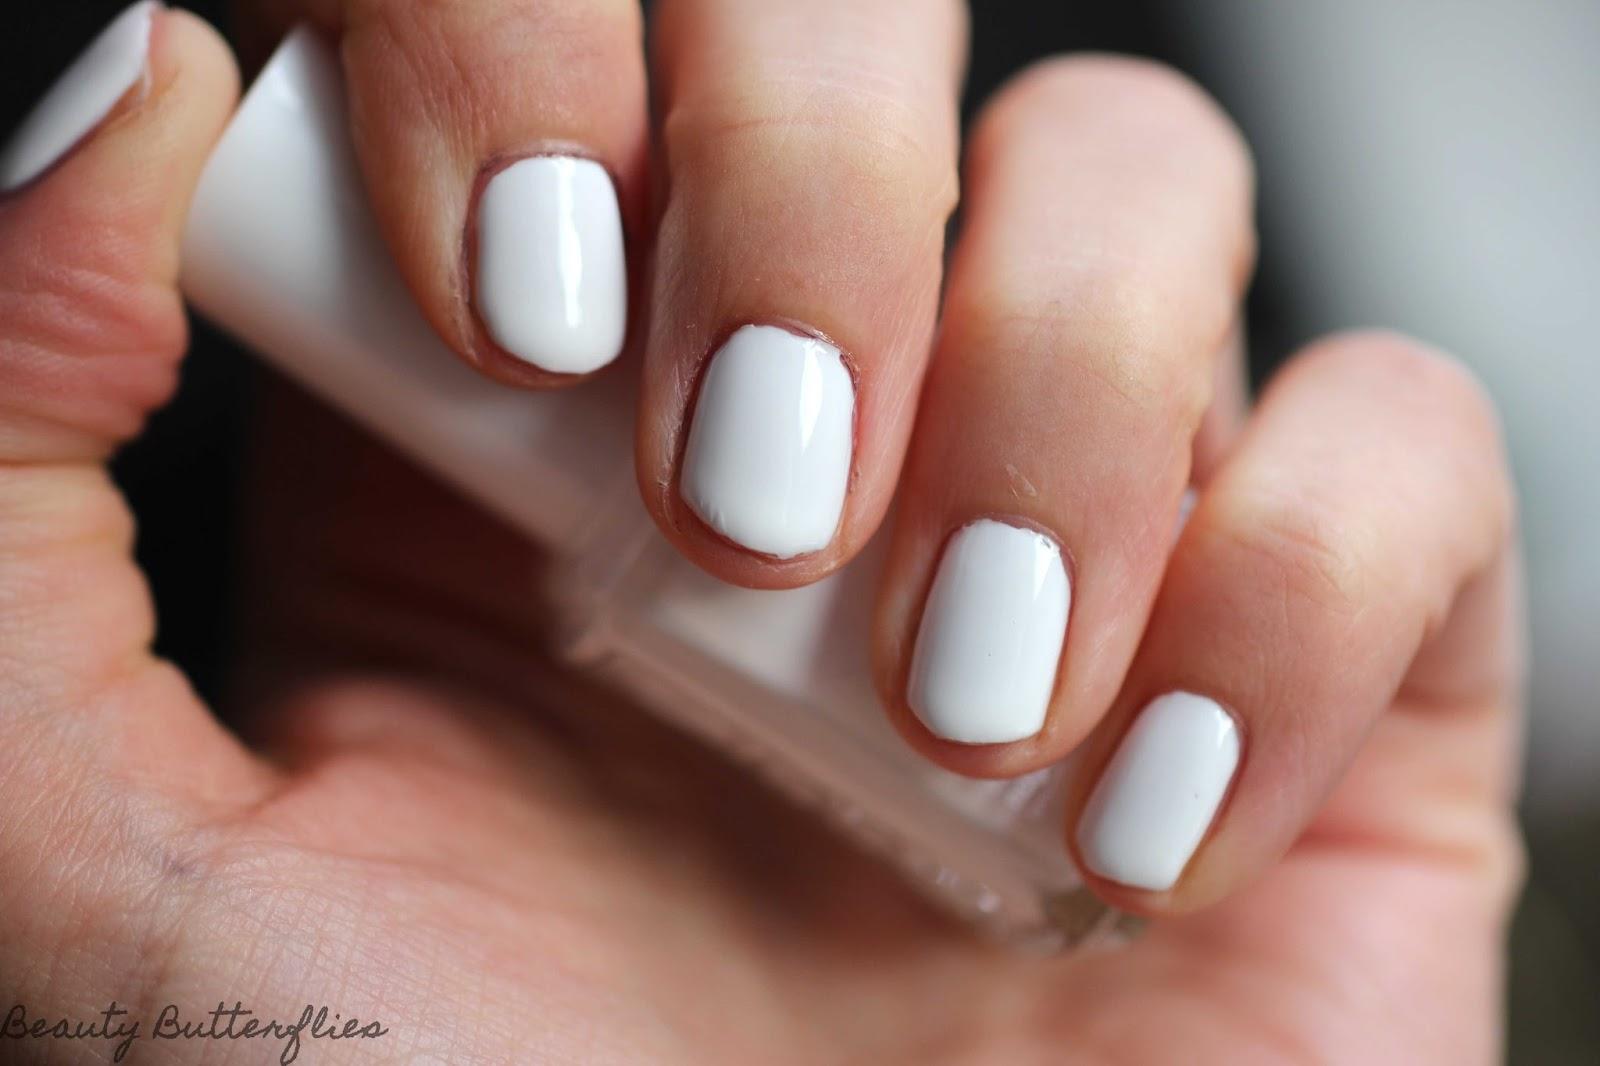 "meine nägel ziehen ""blanc"" - weißer lack - yay or nay? - beauty"